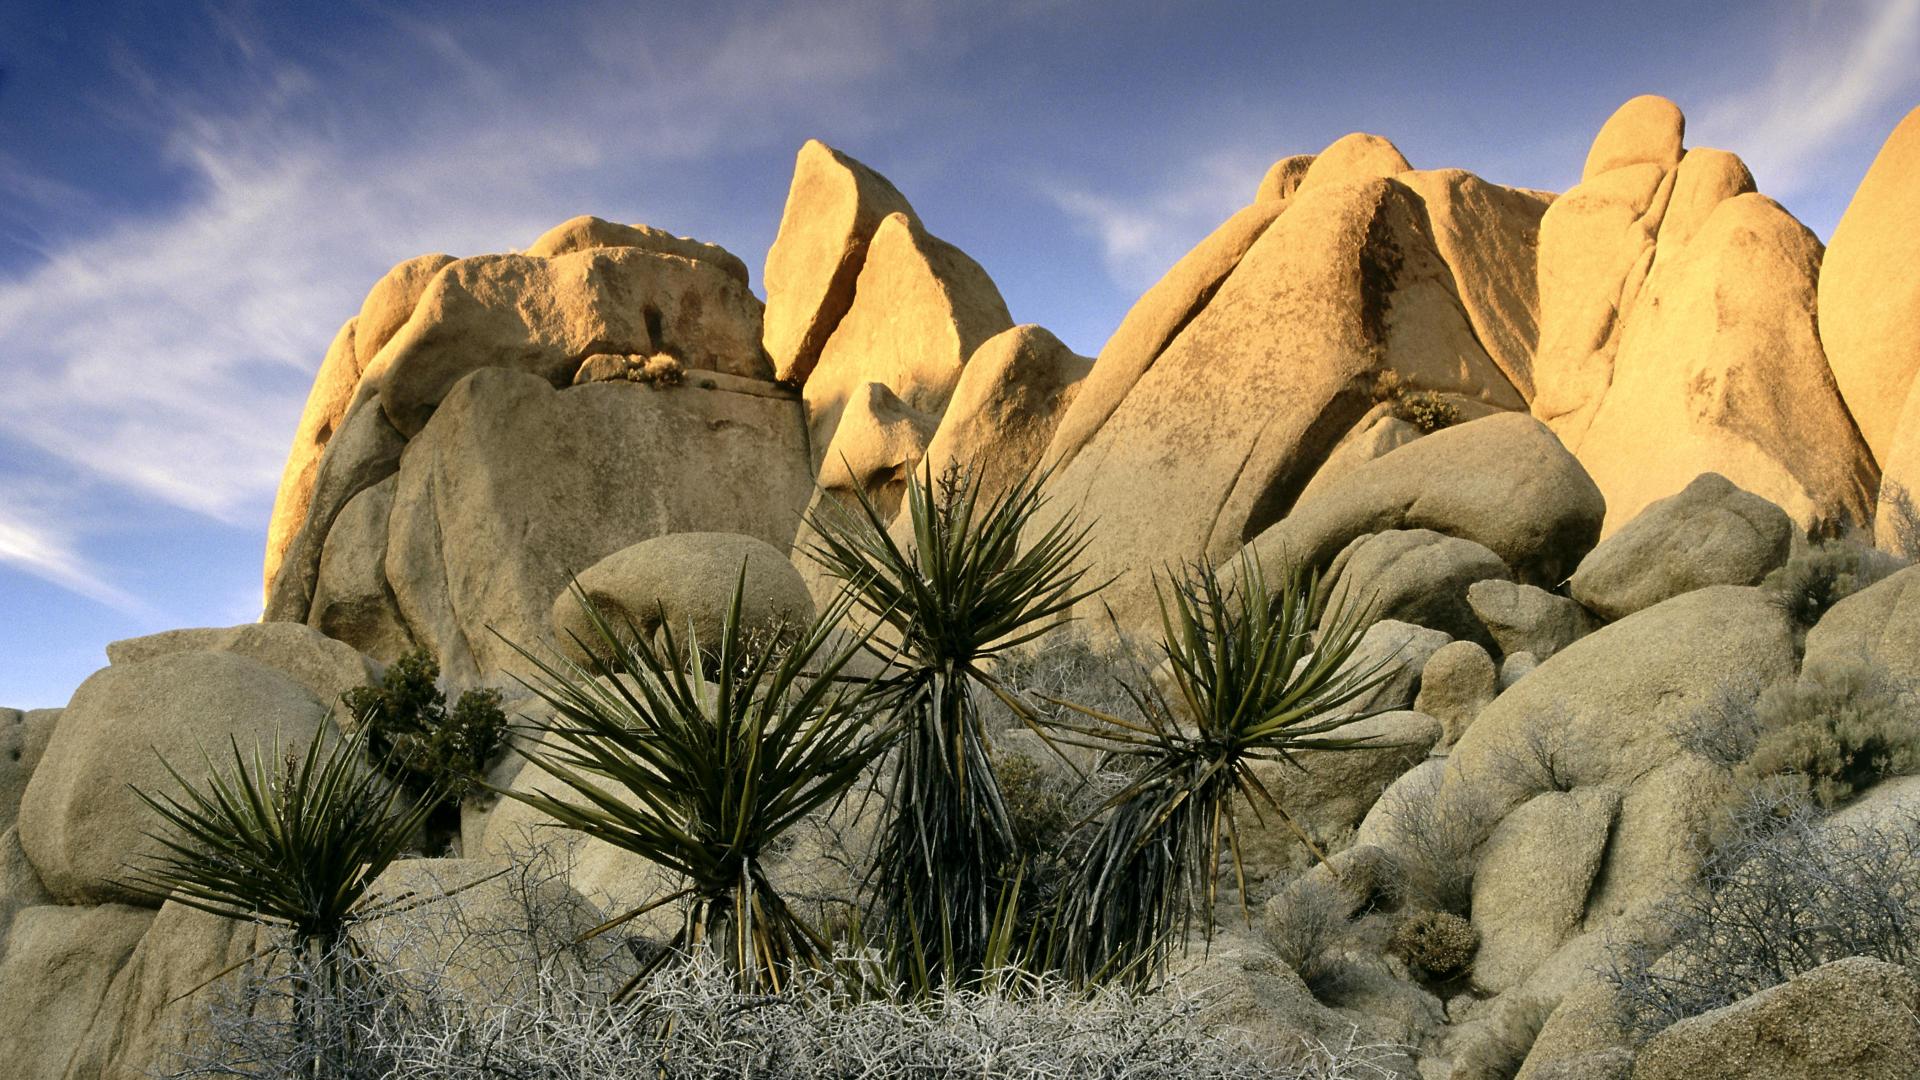 Rock Formations Joshua Tree National Park California The Golden Scope